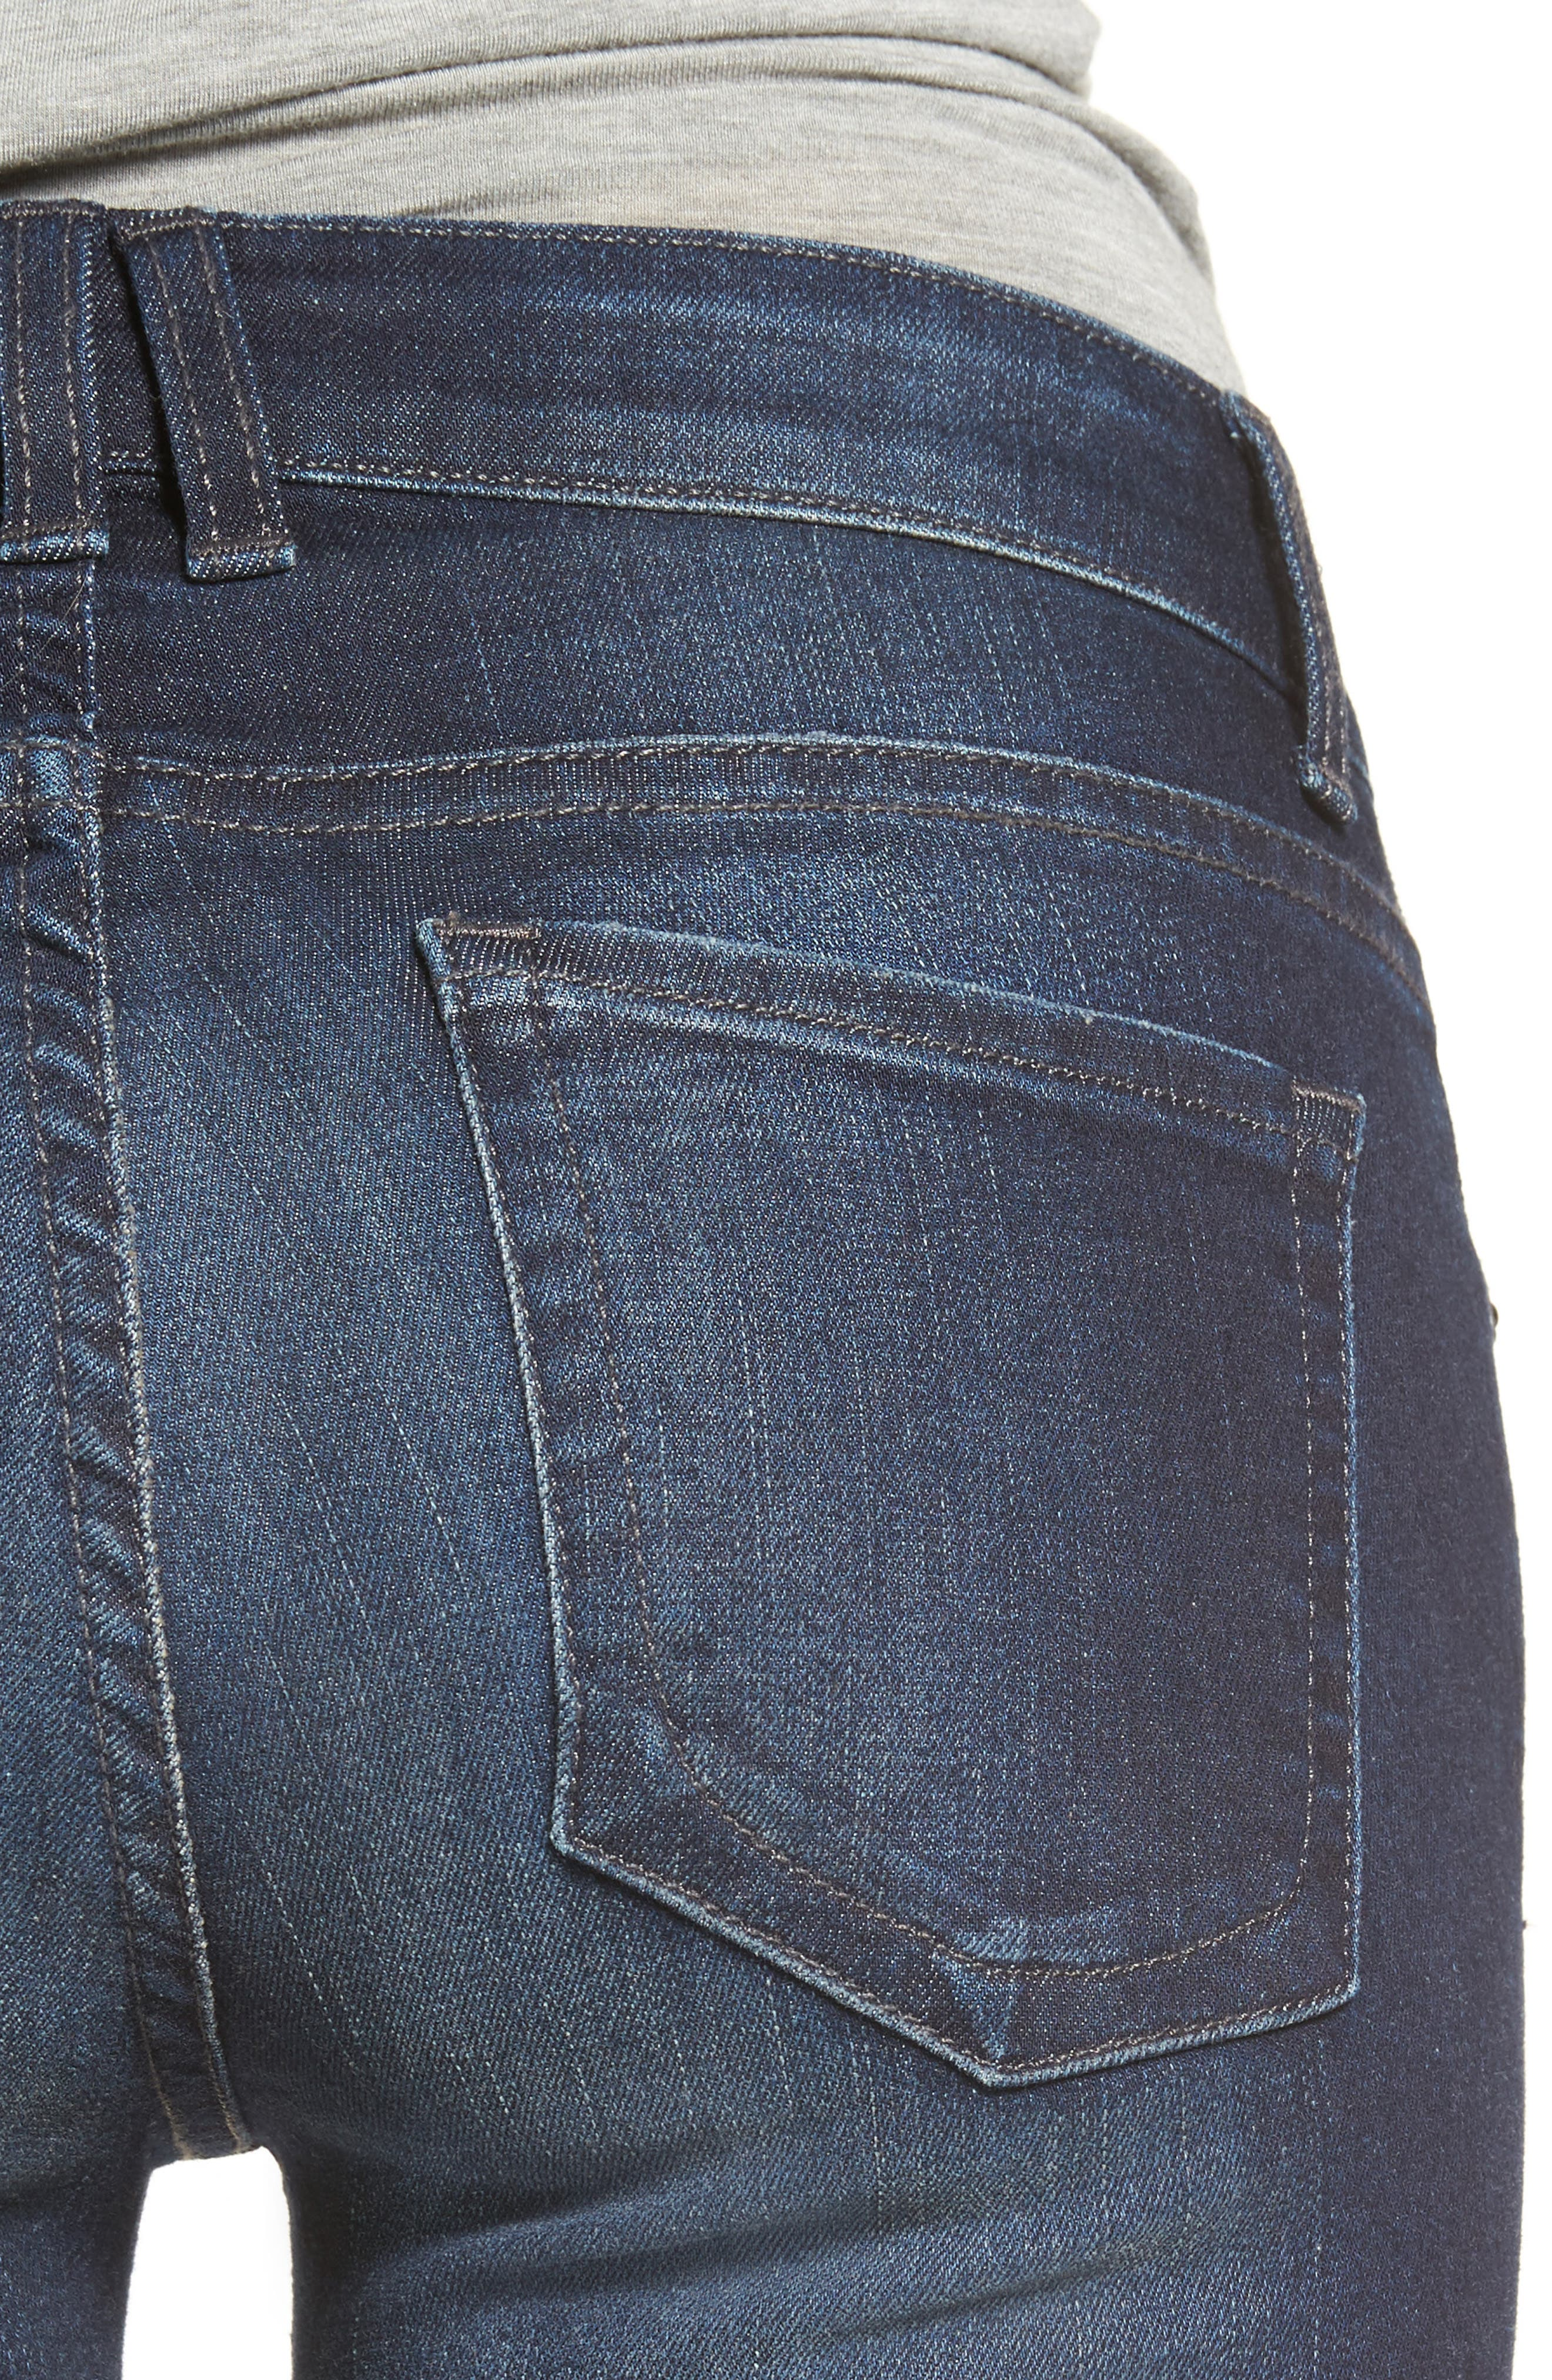 Alternate Image 5  - KUT from the Kloth Catherine Boyfriend Jeans (Regular & Petite) (Vogue)